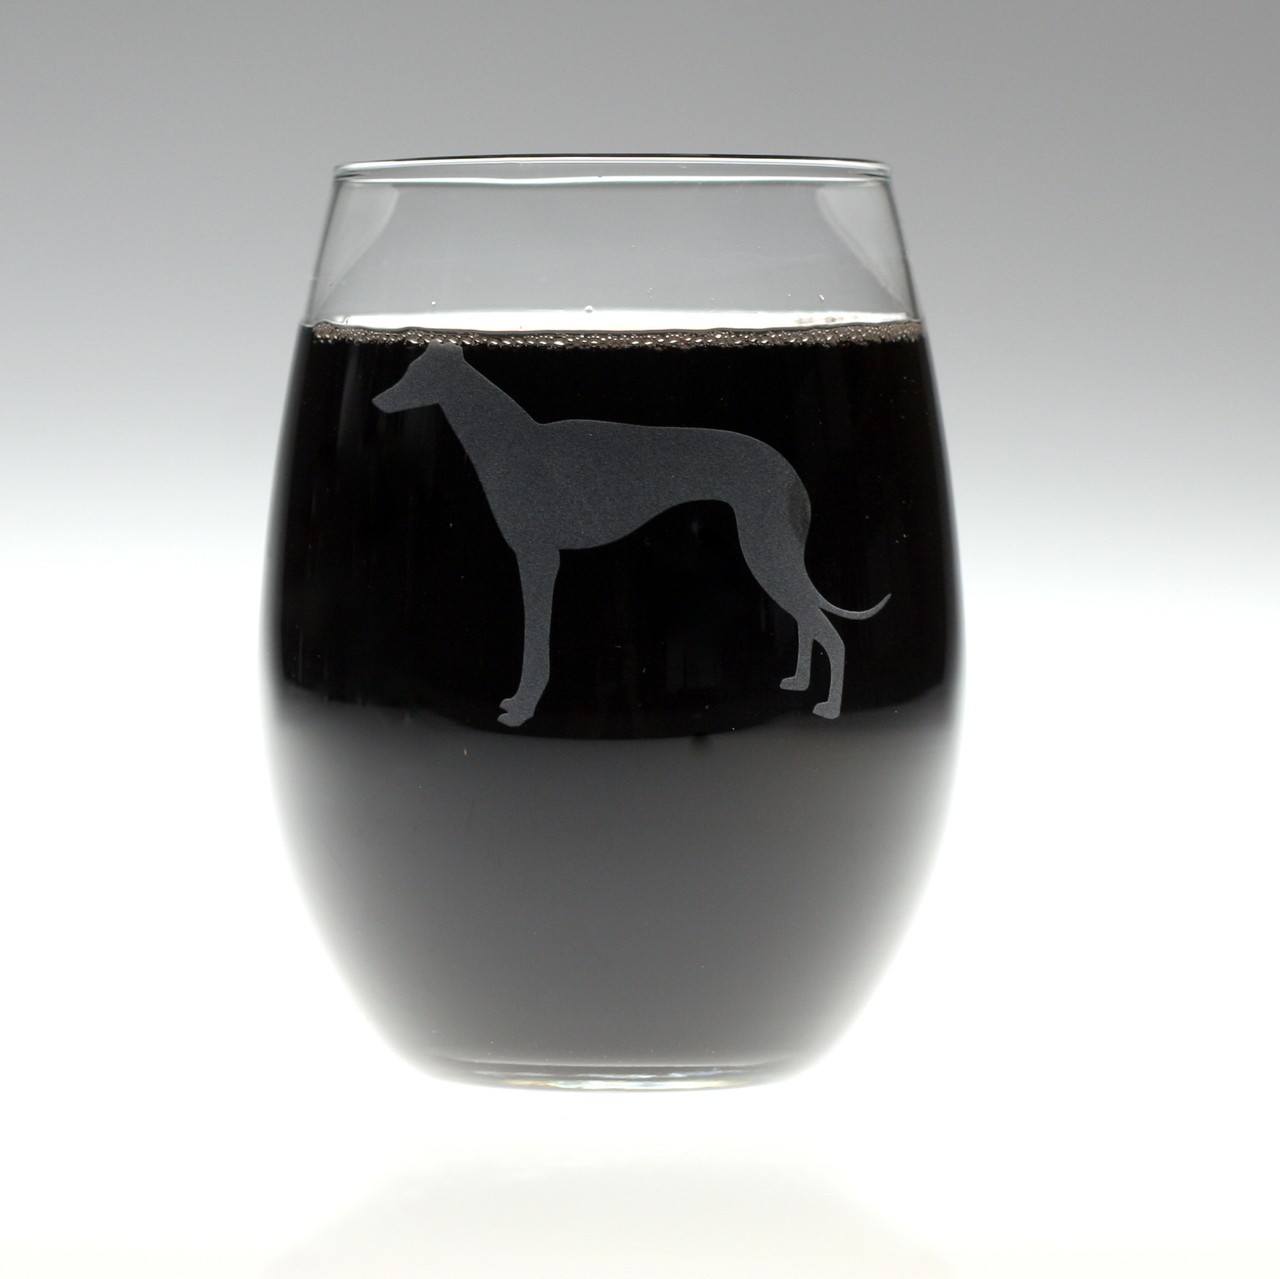 668351a5f16 Greyhound Dog Engraved Wine Glass. Price: $18.00. Image 1